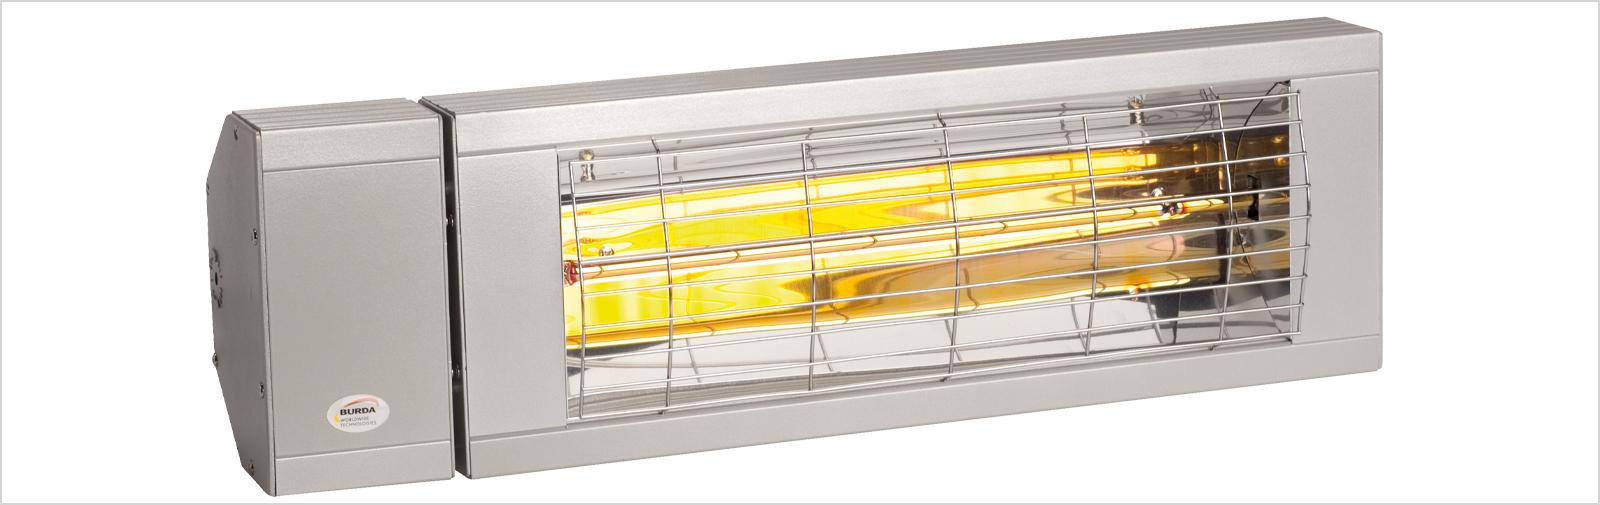 chauffage rayonnant infrarouge IP24